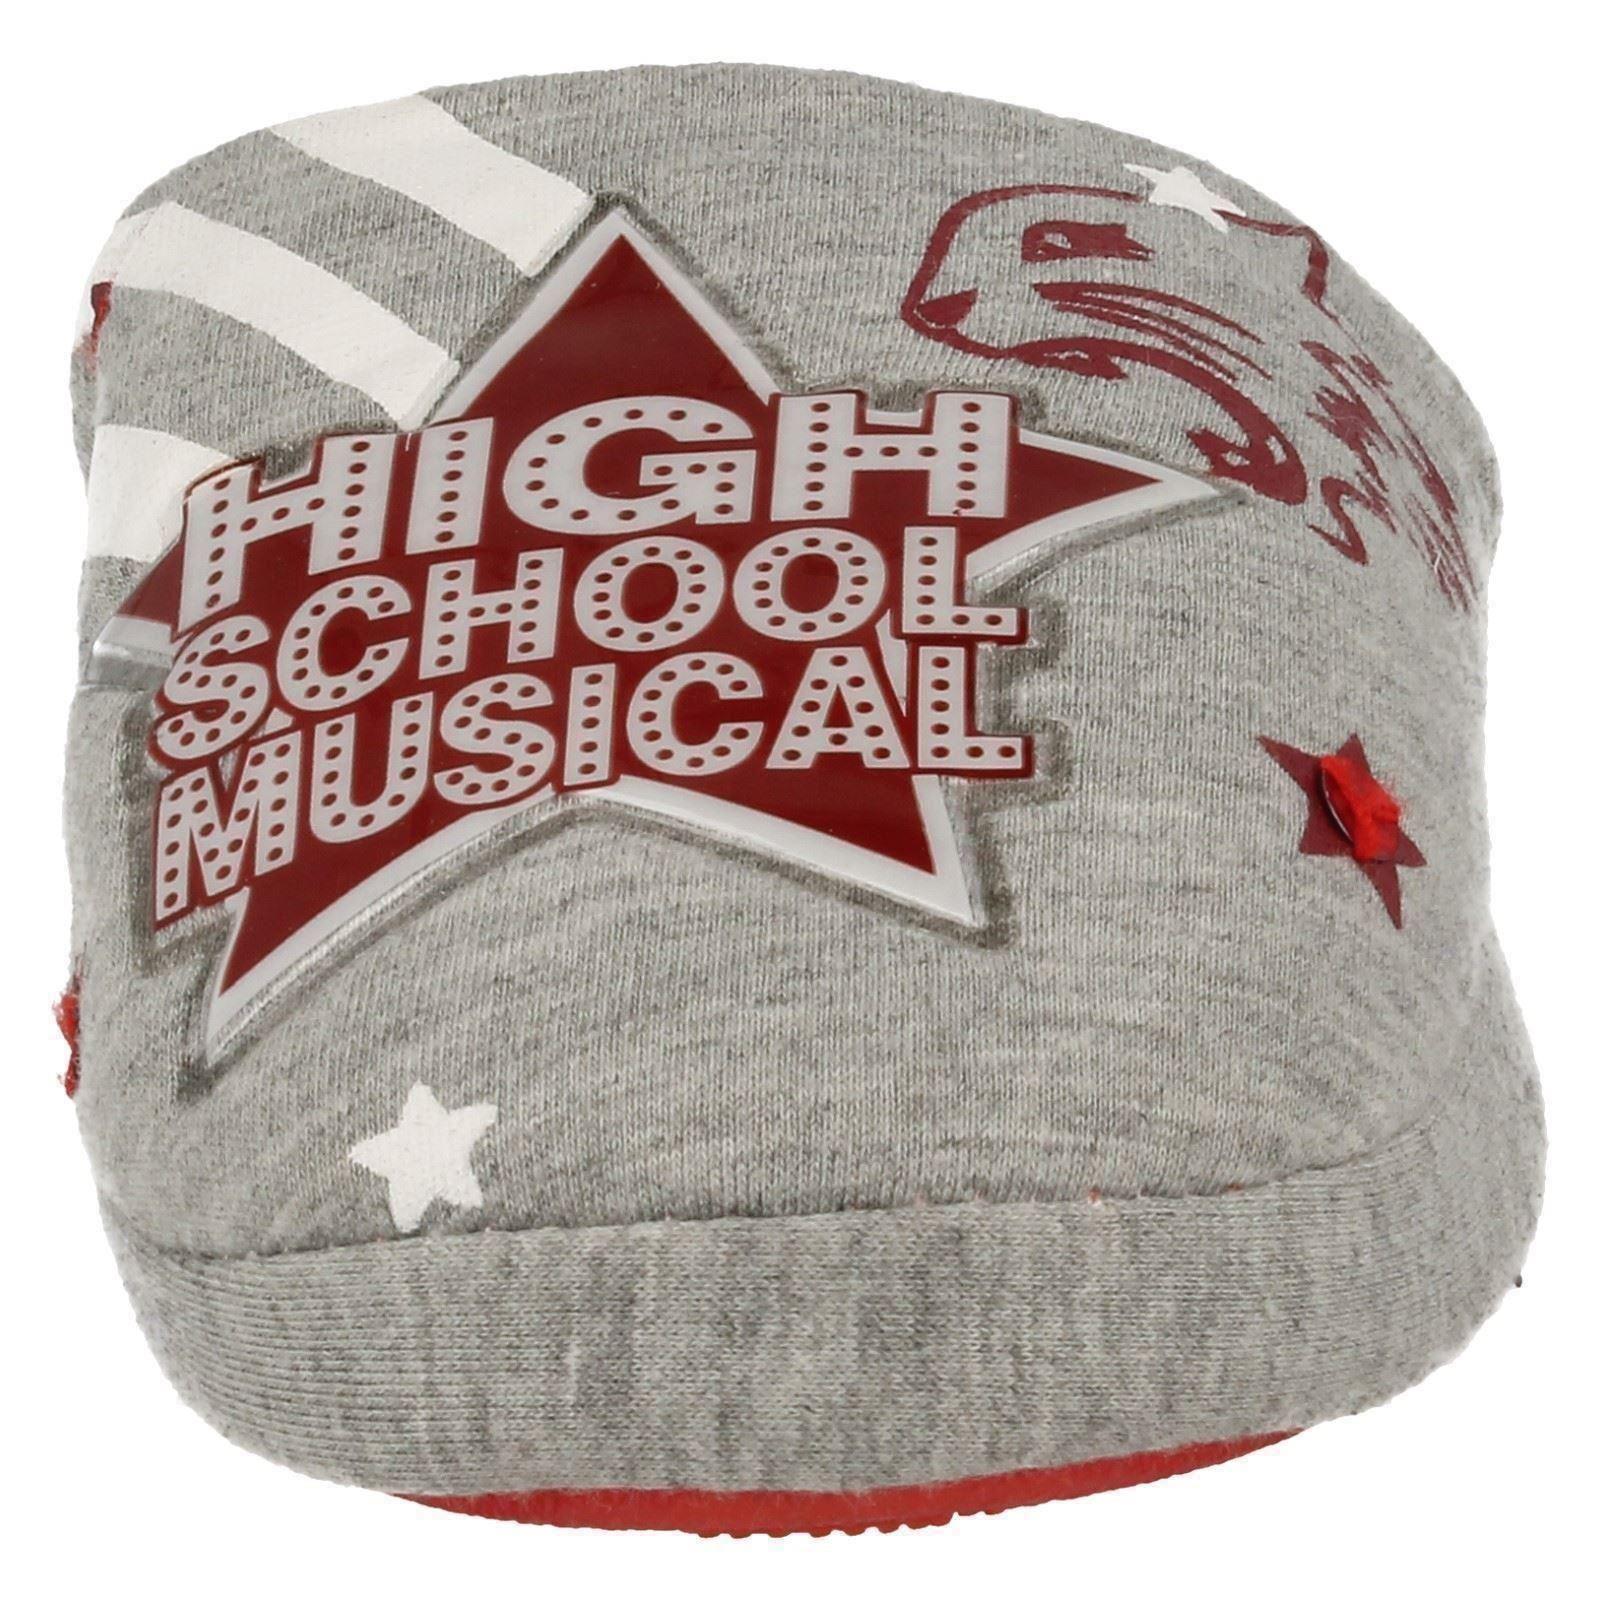 Chicas High School Musical Mula Pantuflas East Alta